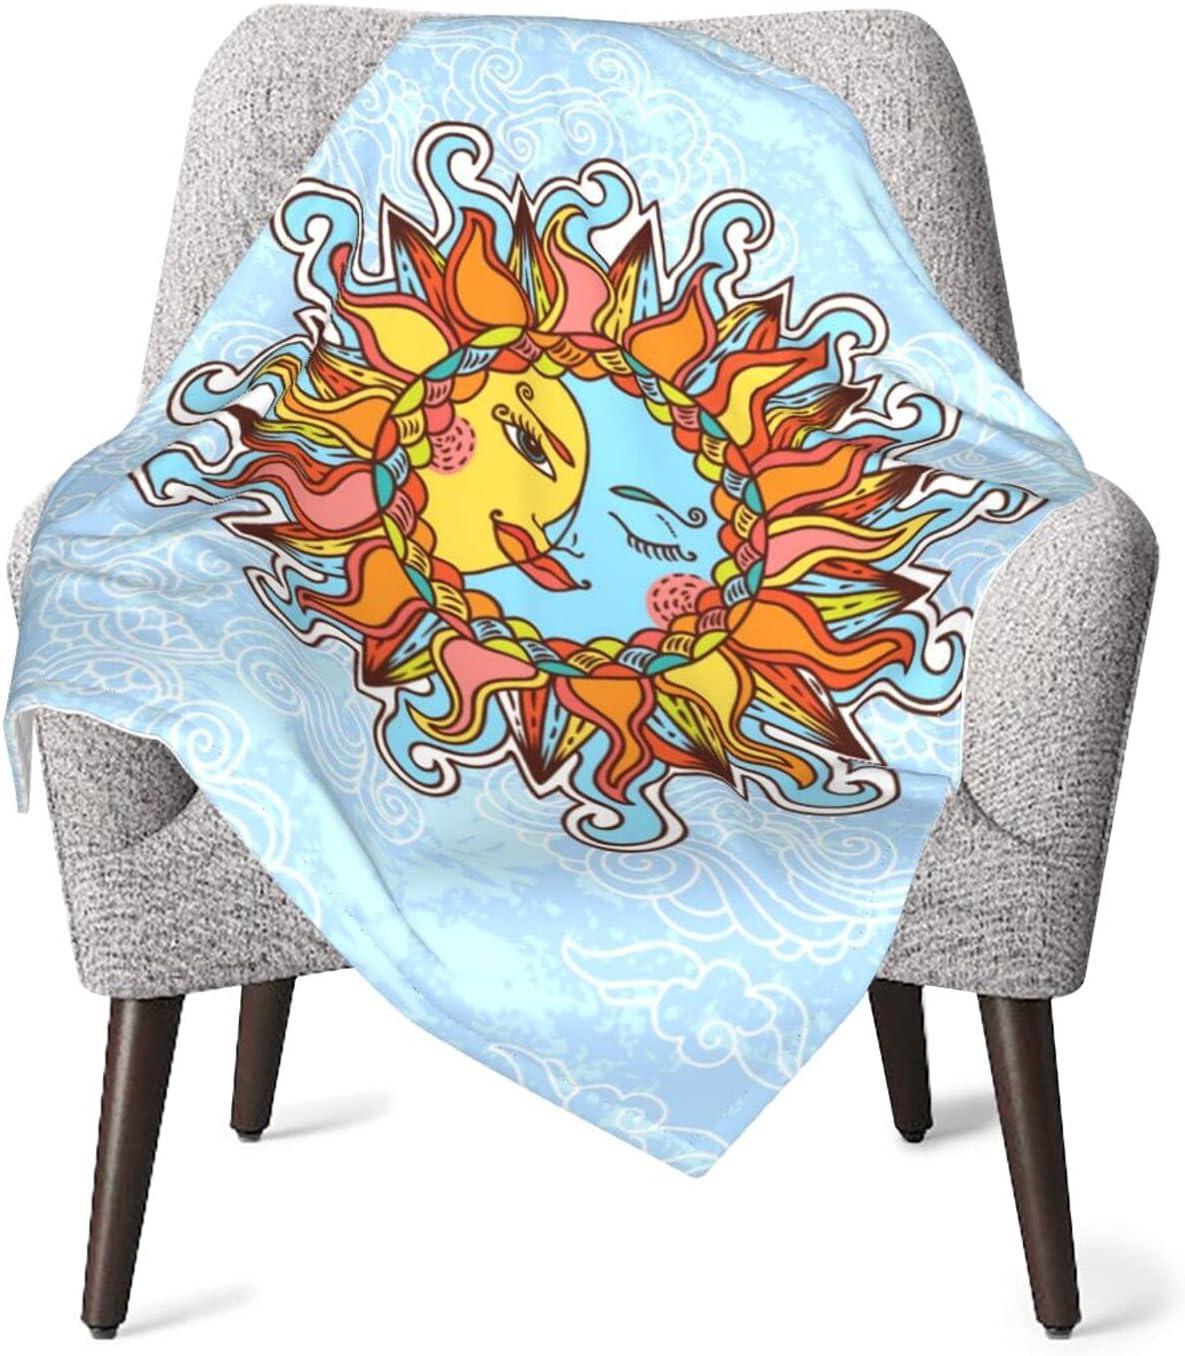 Duduho Magic Sun and Moon Baby Fuzzy Blankets Soft Atlanta Mall Warm Plush Be Max 77% OFF